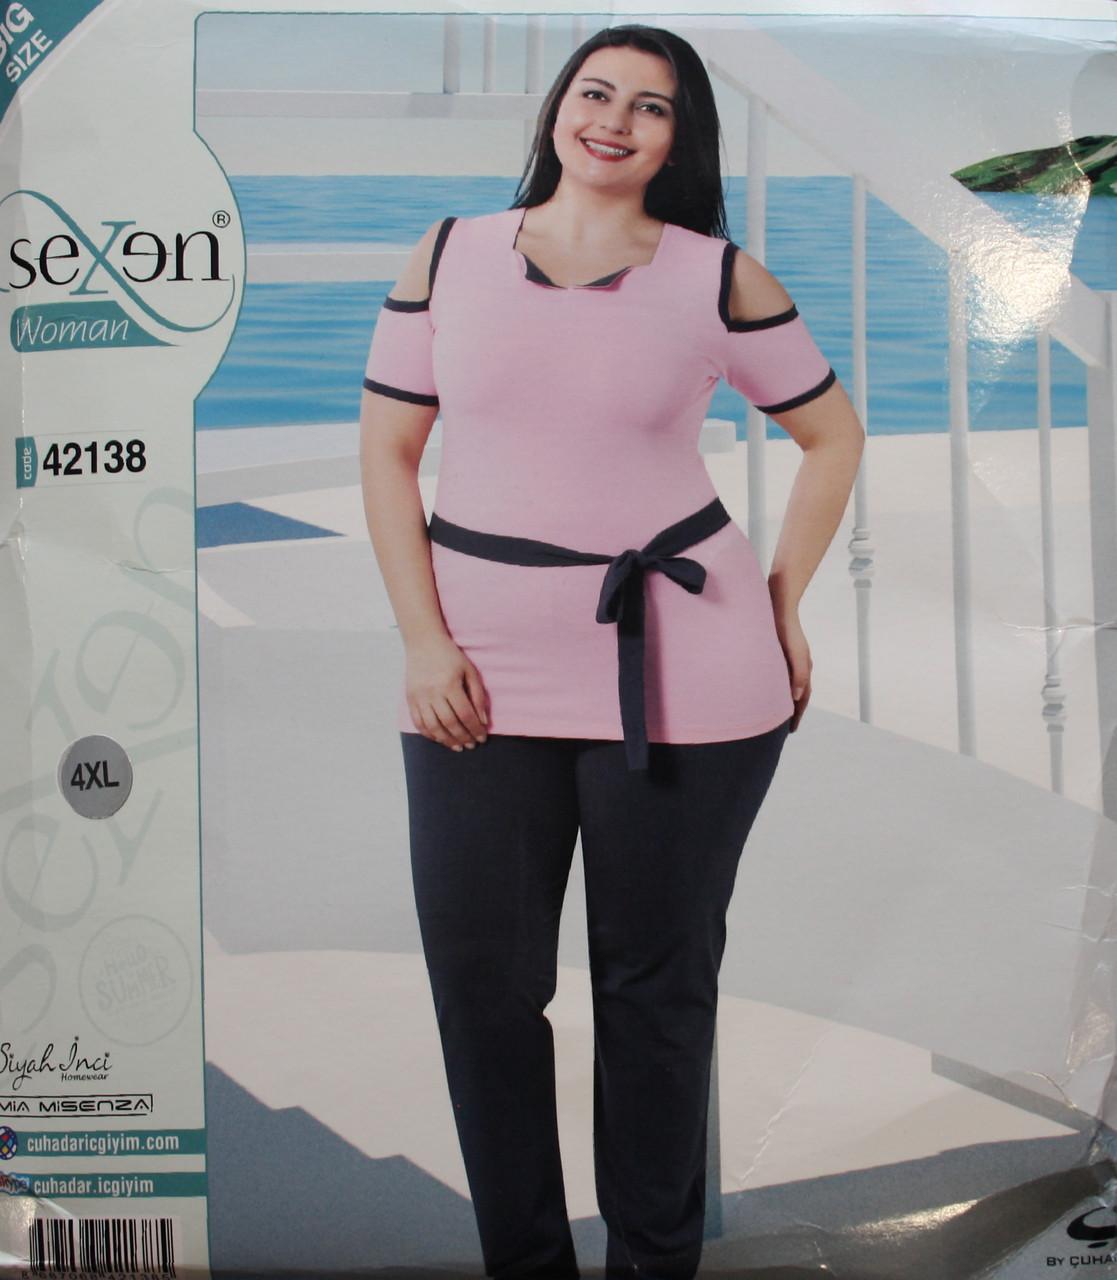 Пижама SEXEN (Батал) женская с коротким рукавом и штанами 42138